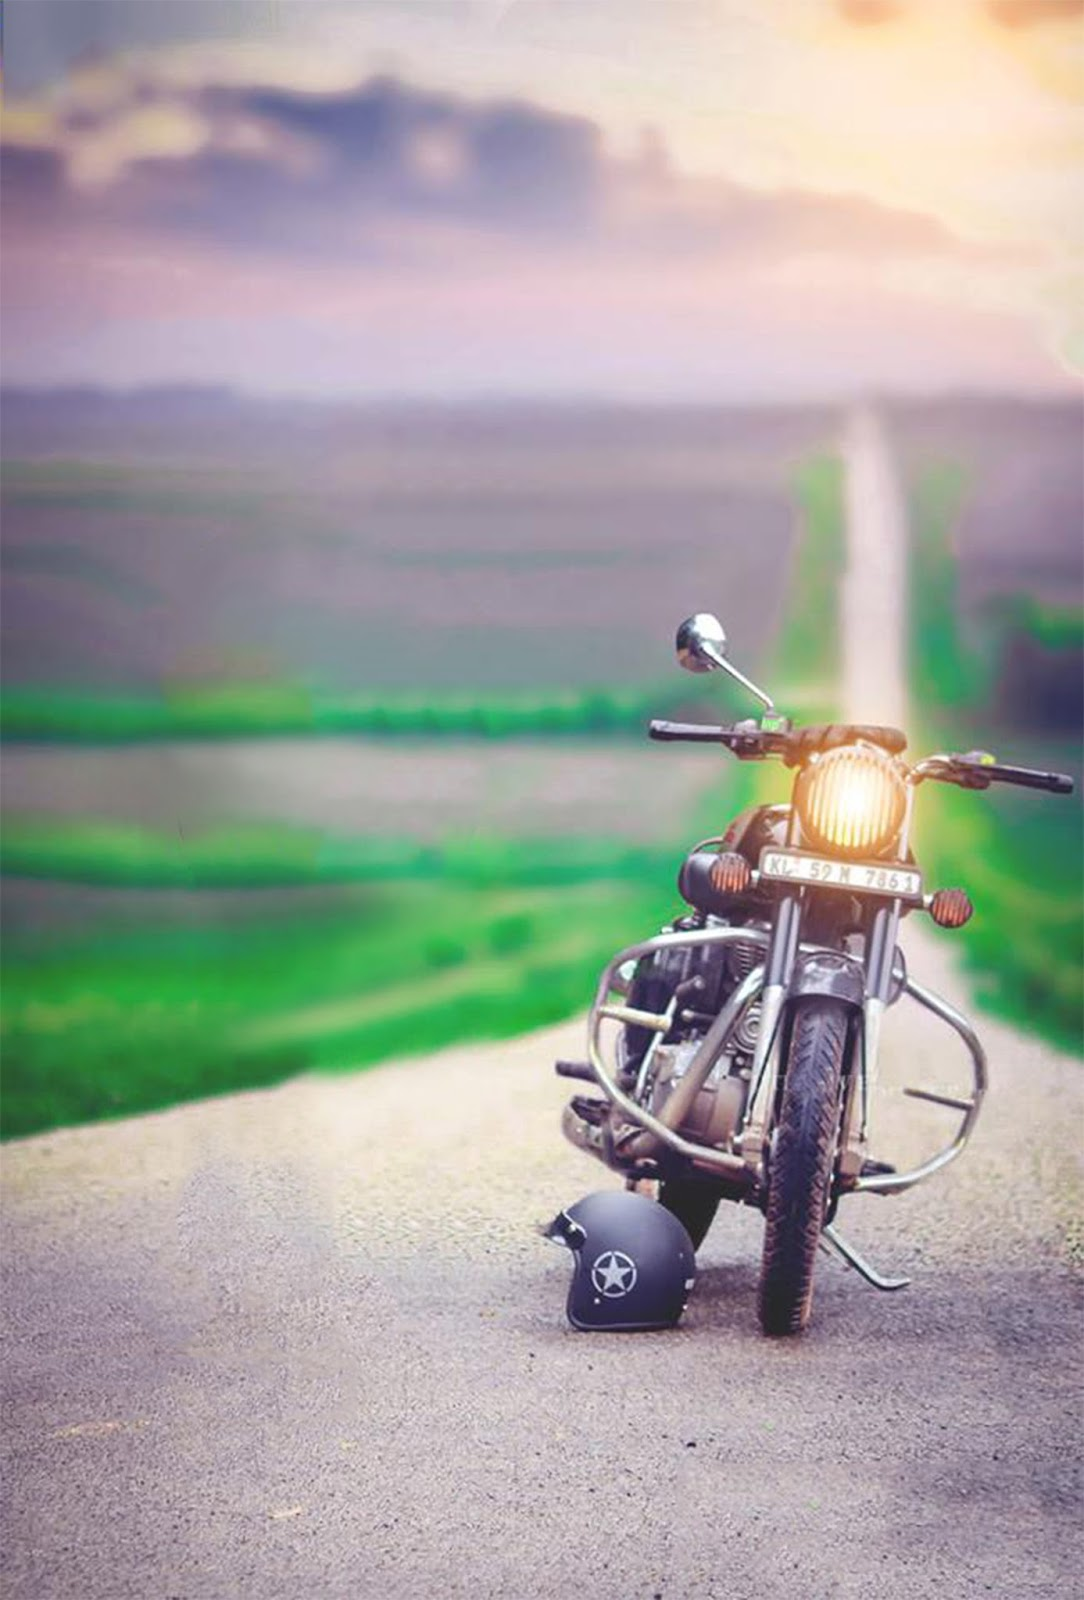 Ultimate Editing : Bike+car,background